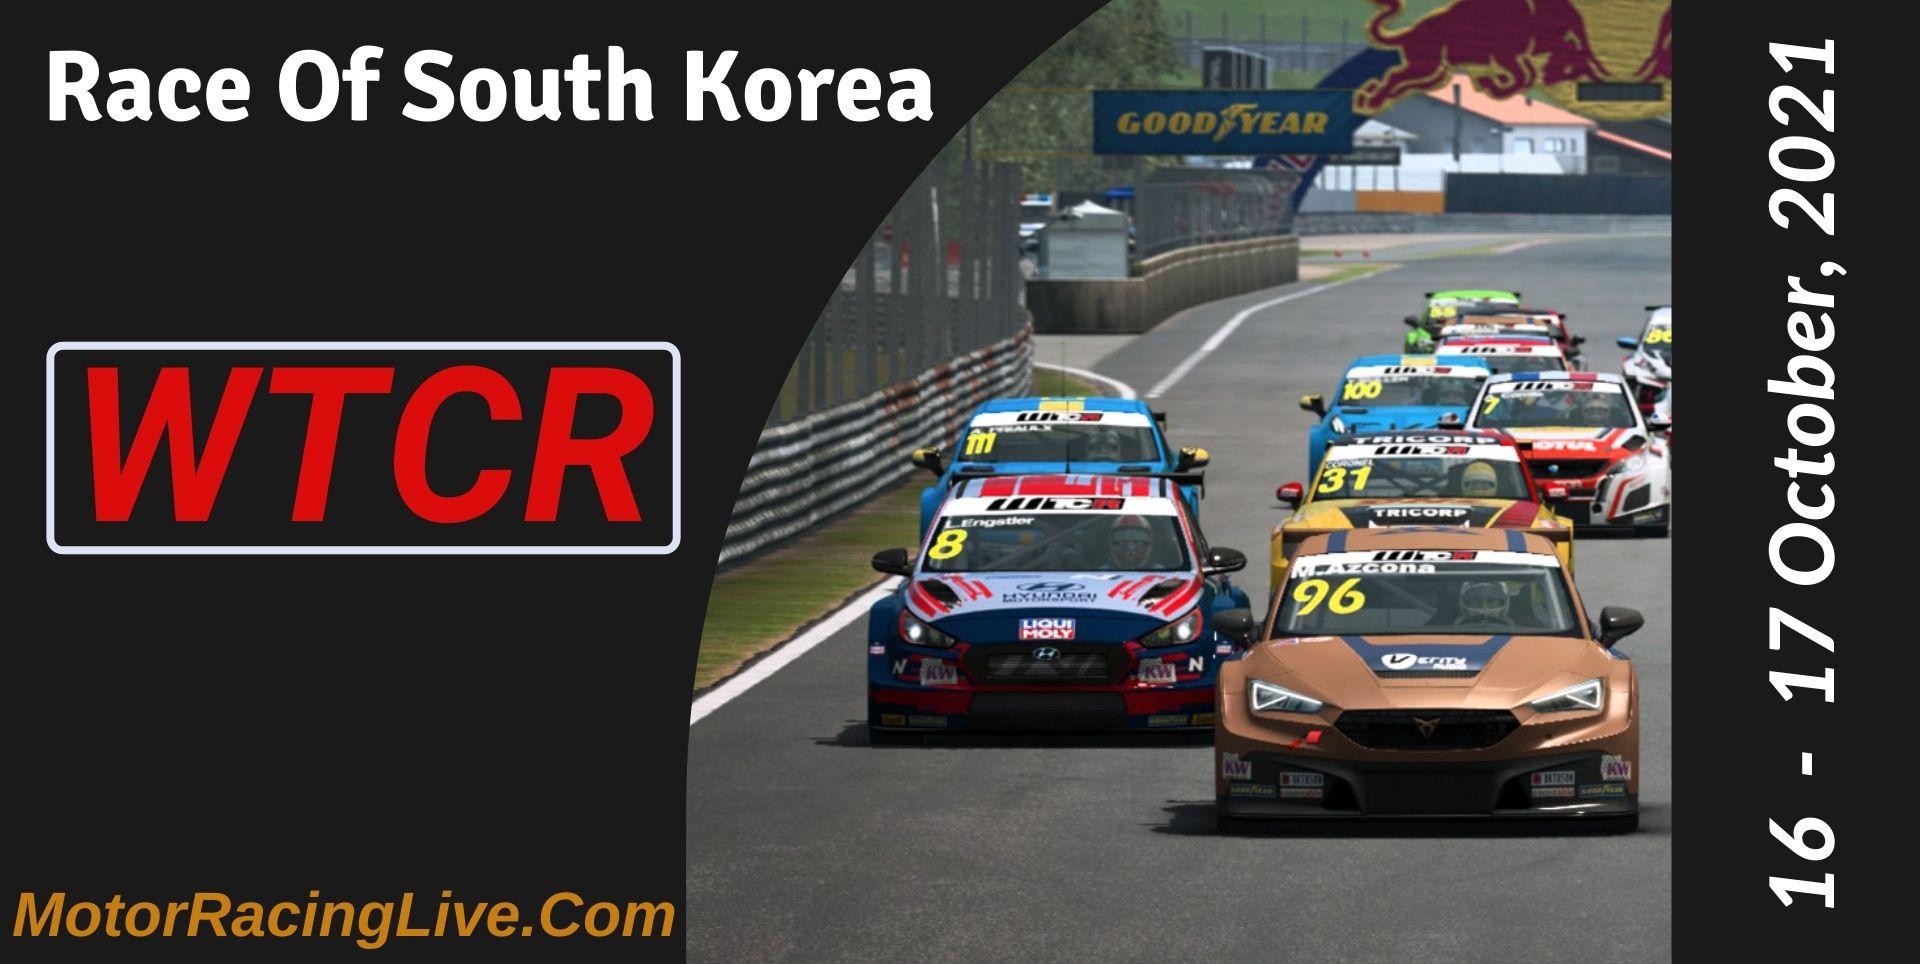 Race Of South Korea Live Stream 2021 | WTCR